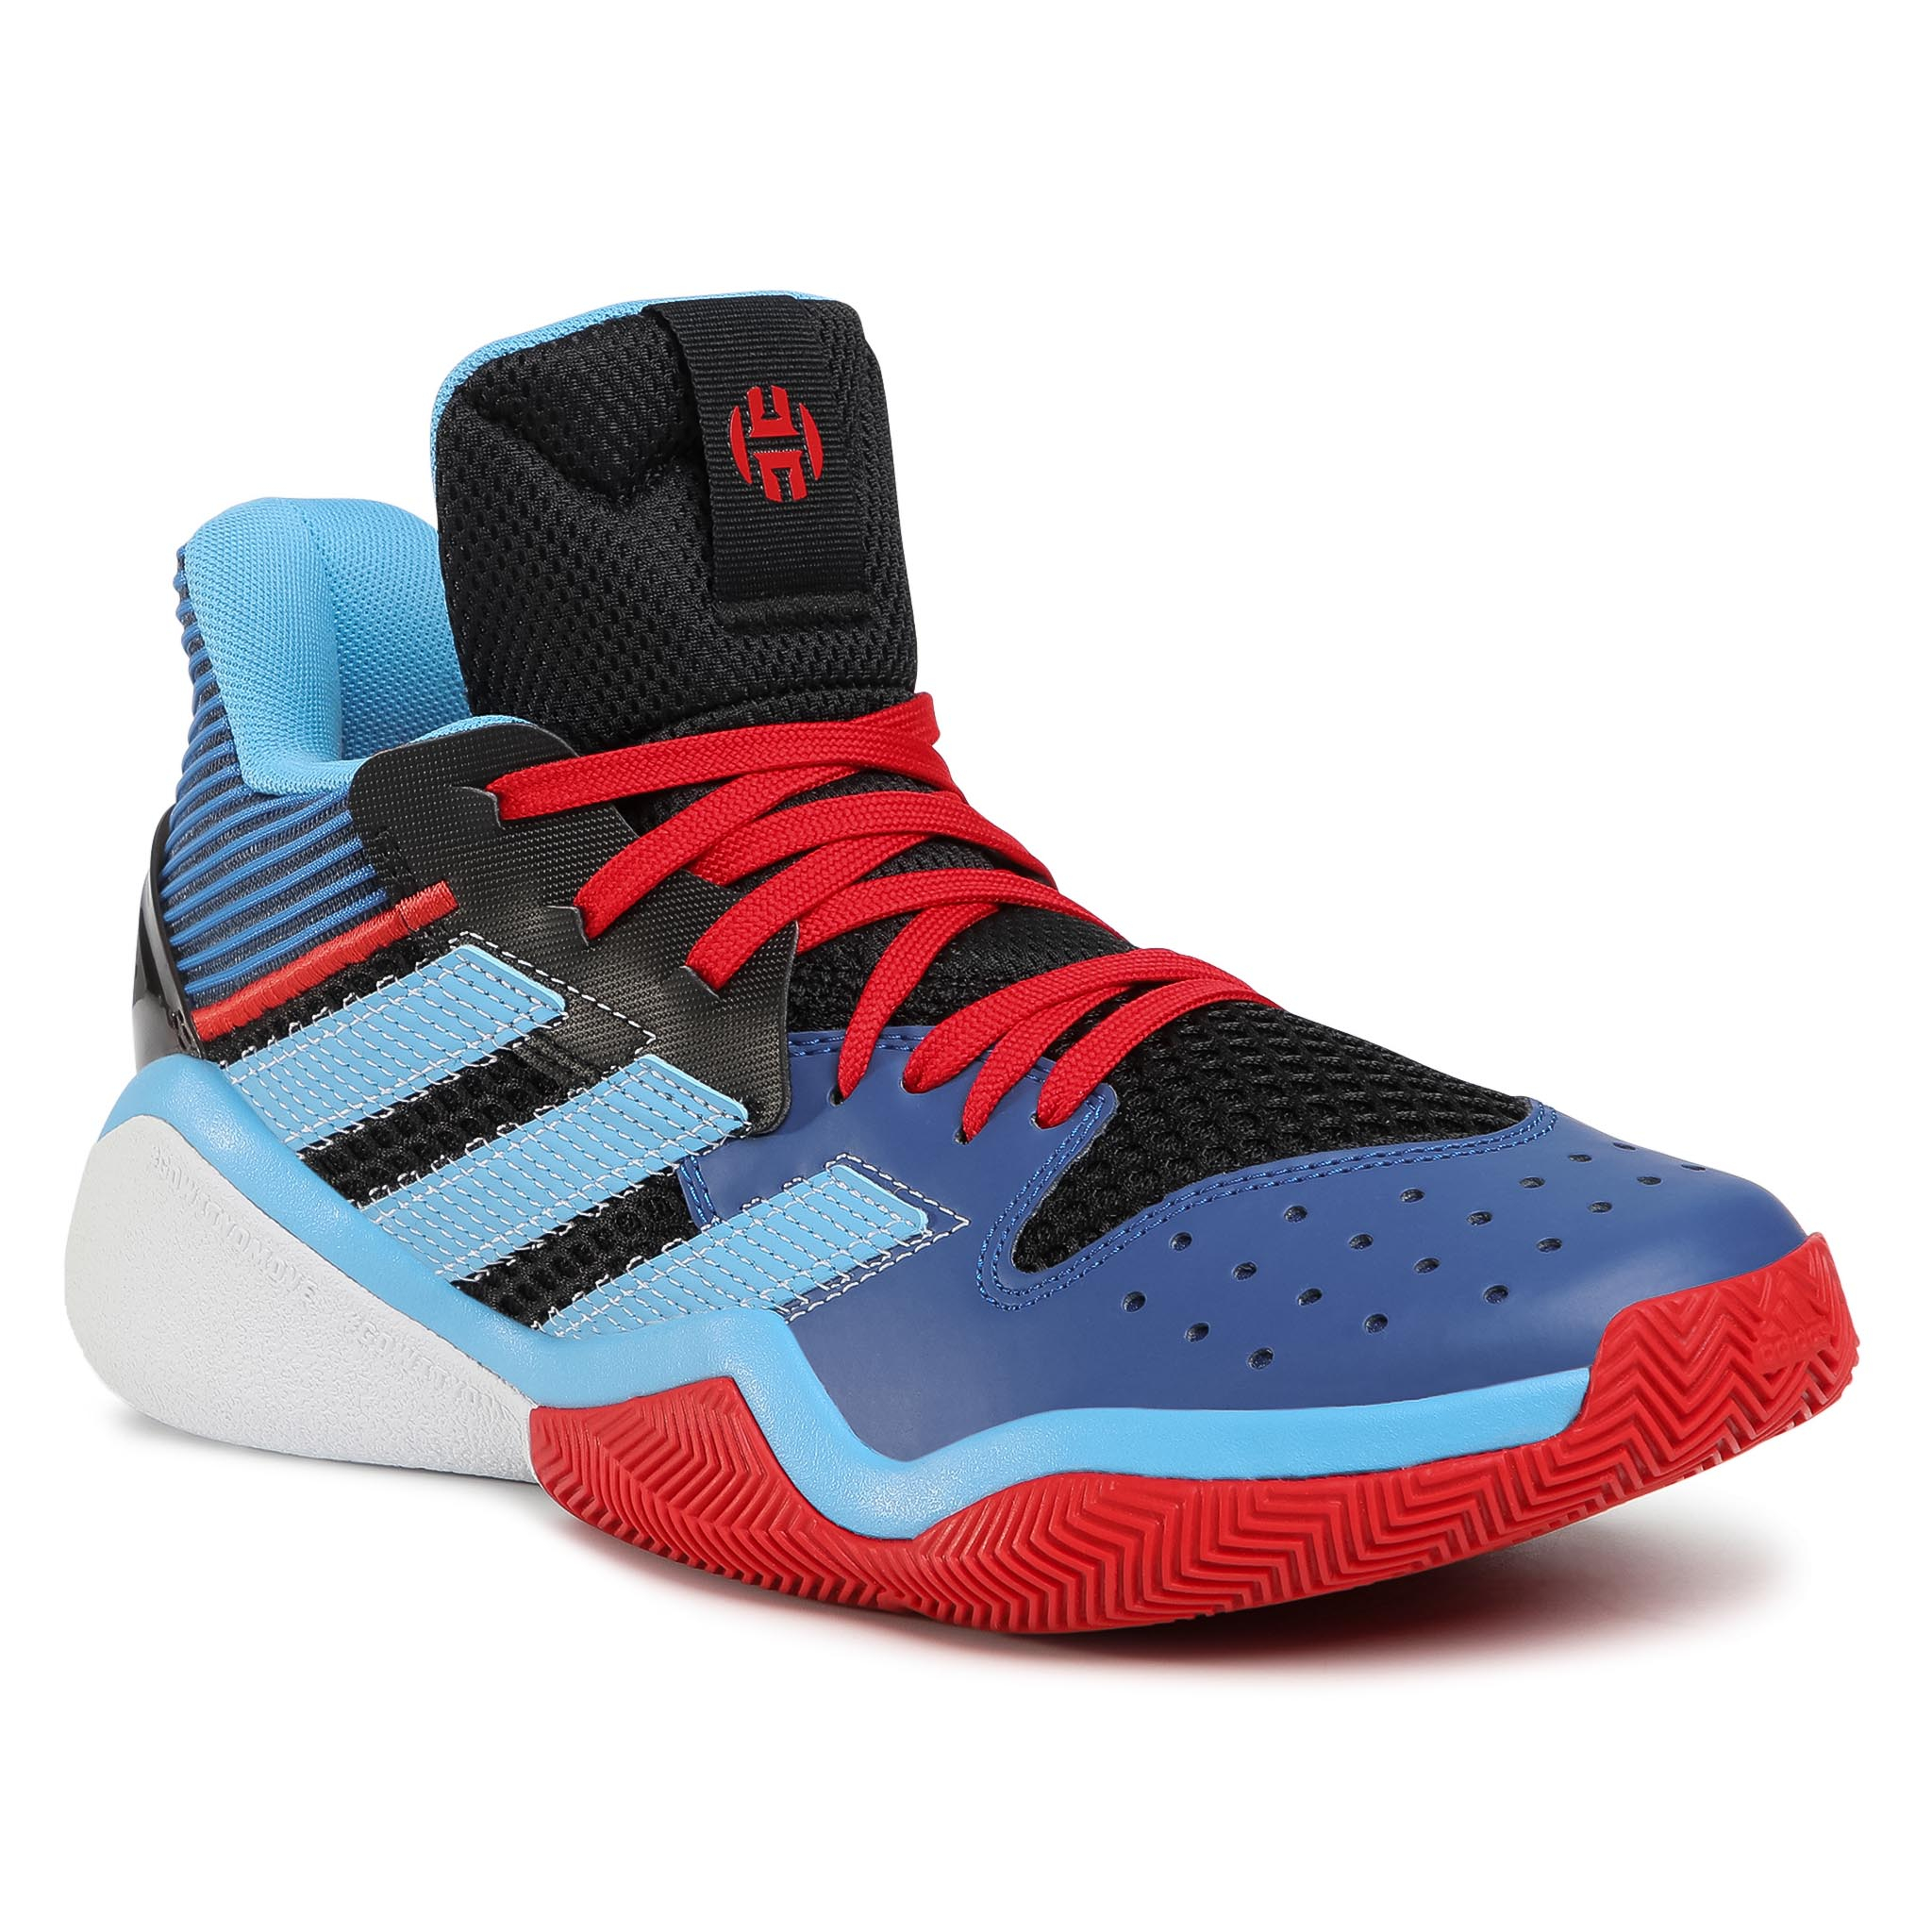 Image of Schuhe adidas - Harden Stepback FW8482 Cblack/Tmlgbl/Croyal